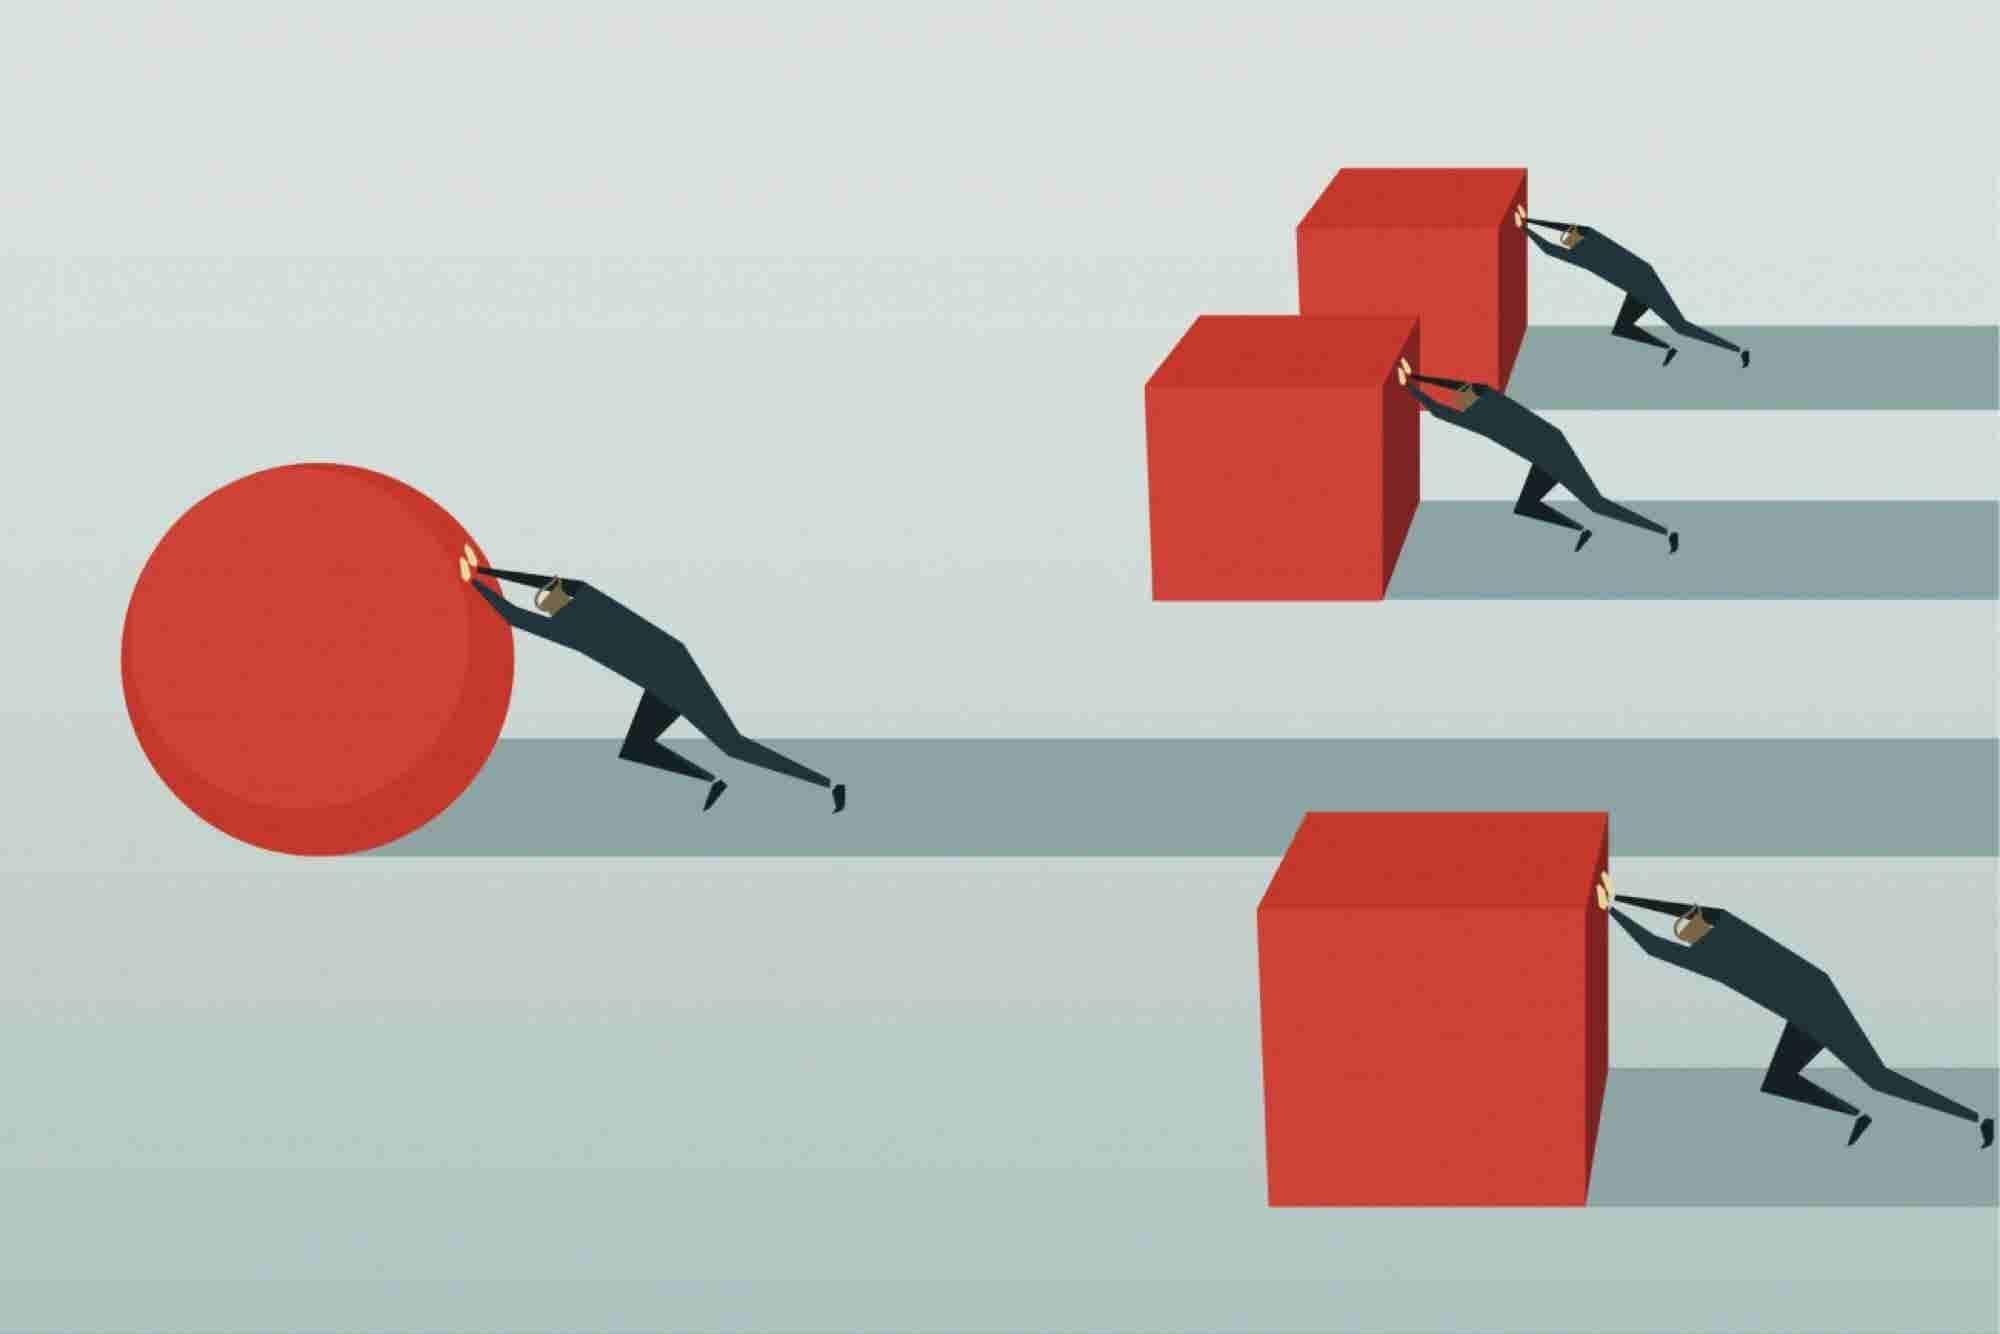 Three New Tools Savvy Entrepreneurs Shouldn't Ignore